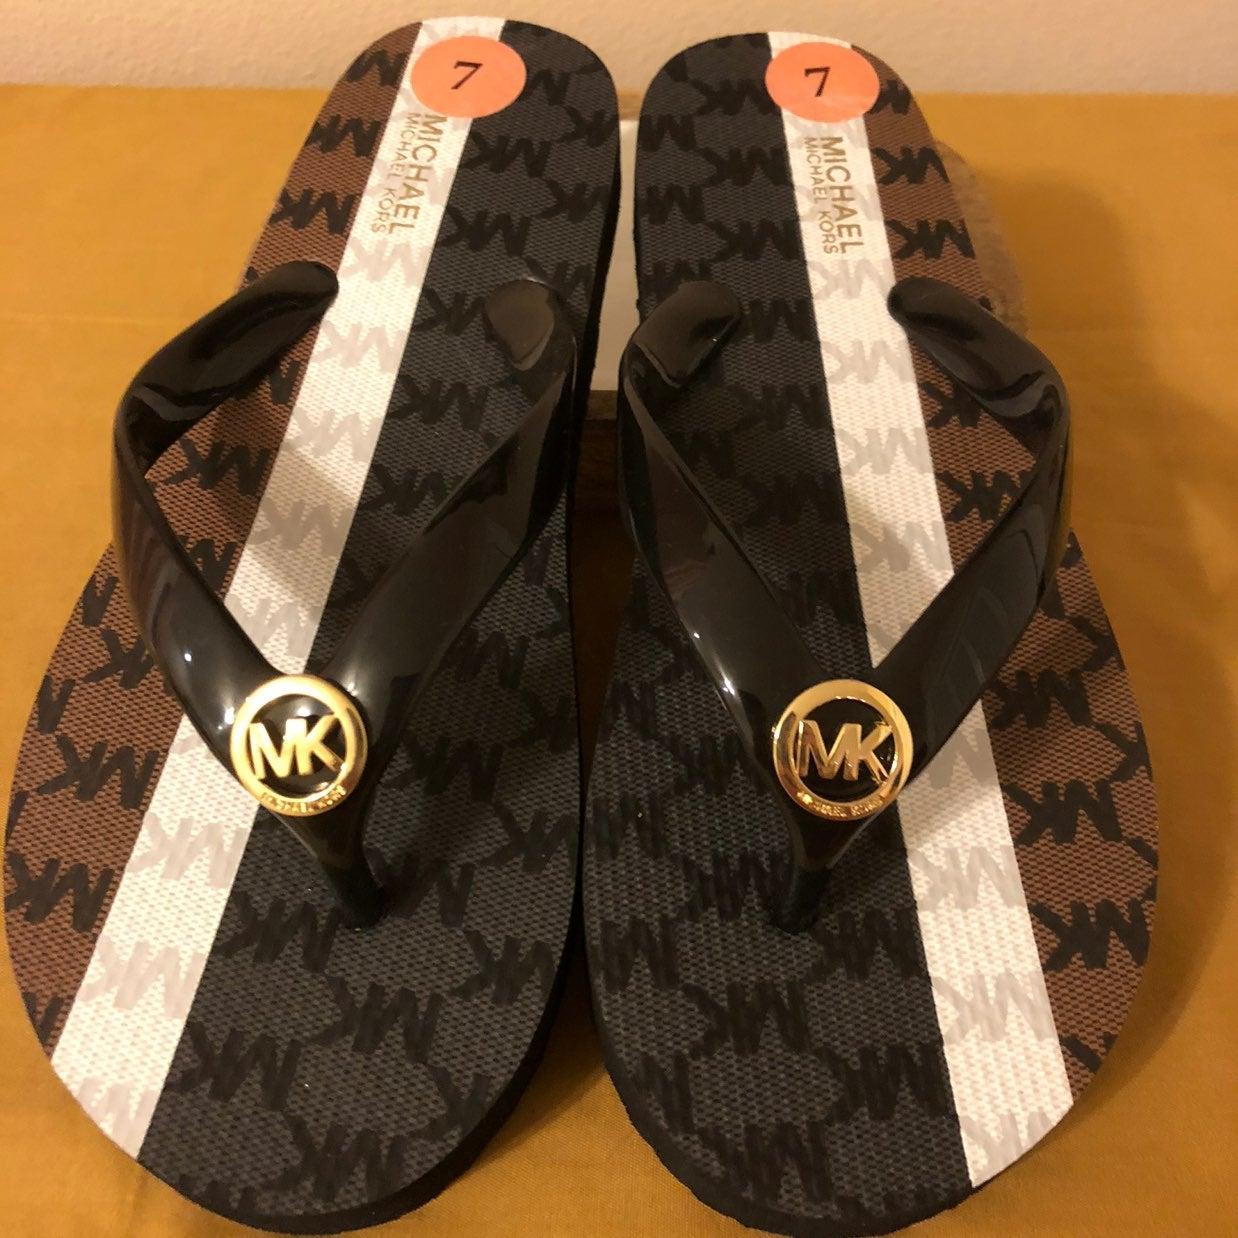 MK flip flops - size 7